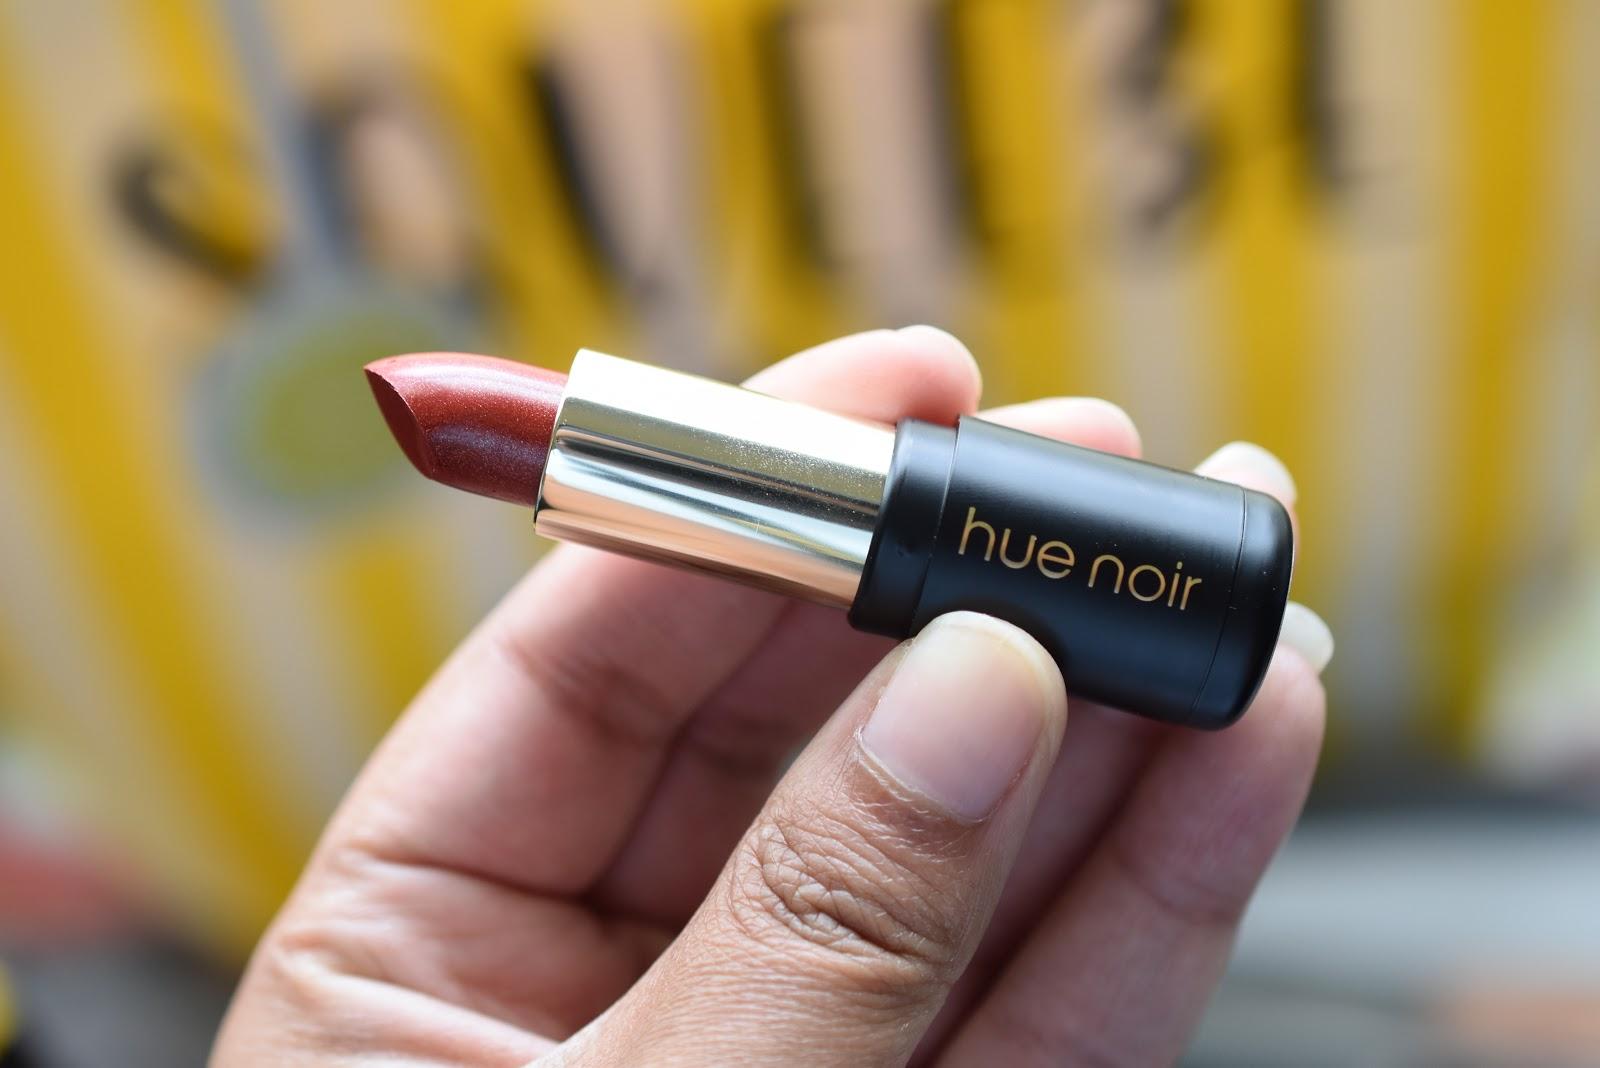 Hue Noir Perfect Pout Hydrating Lipstick